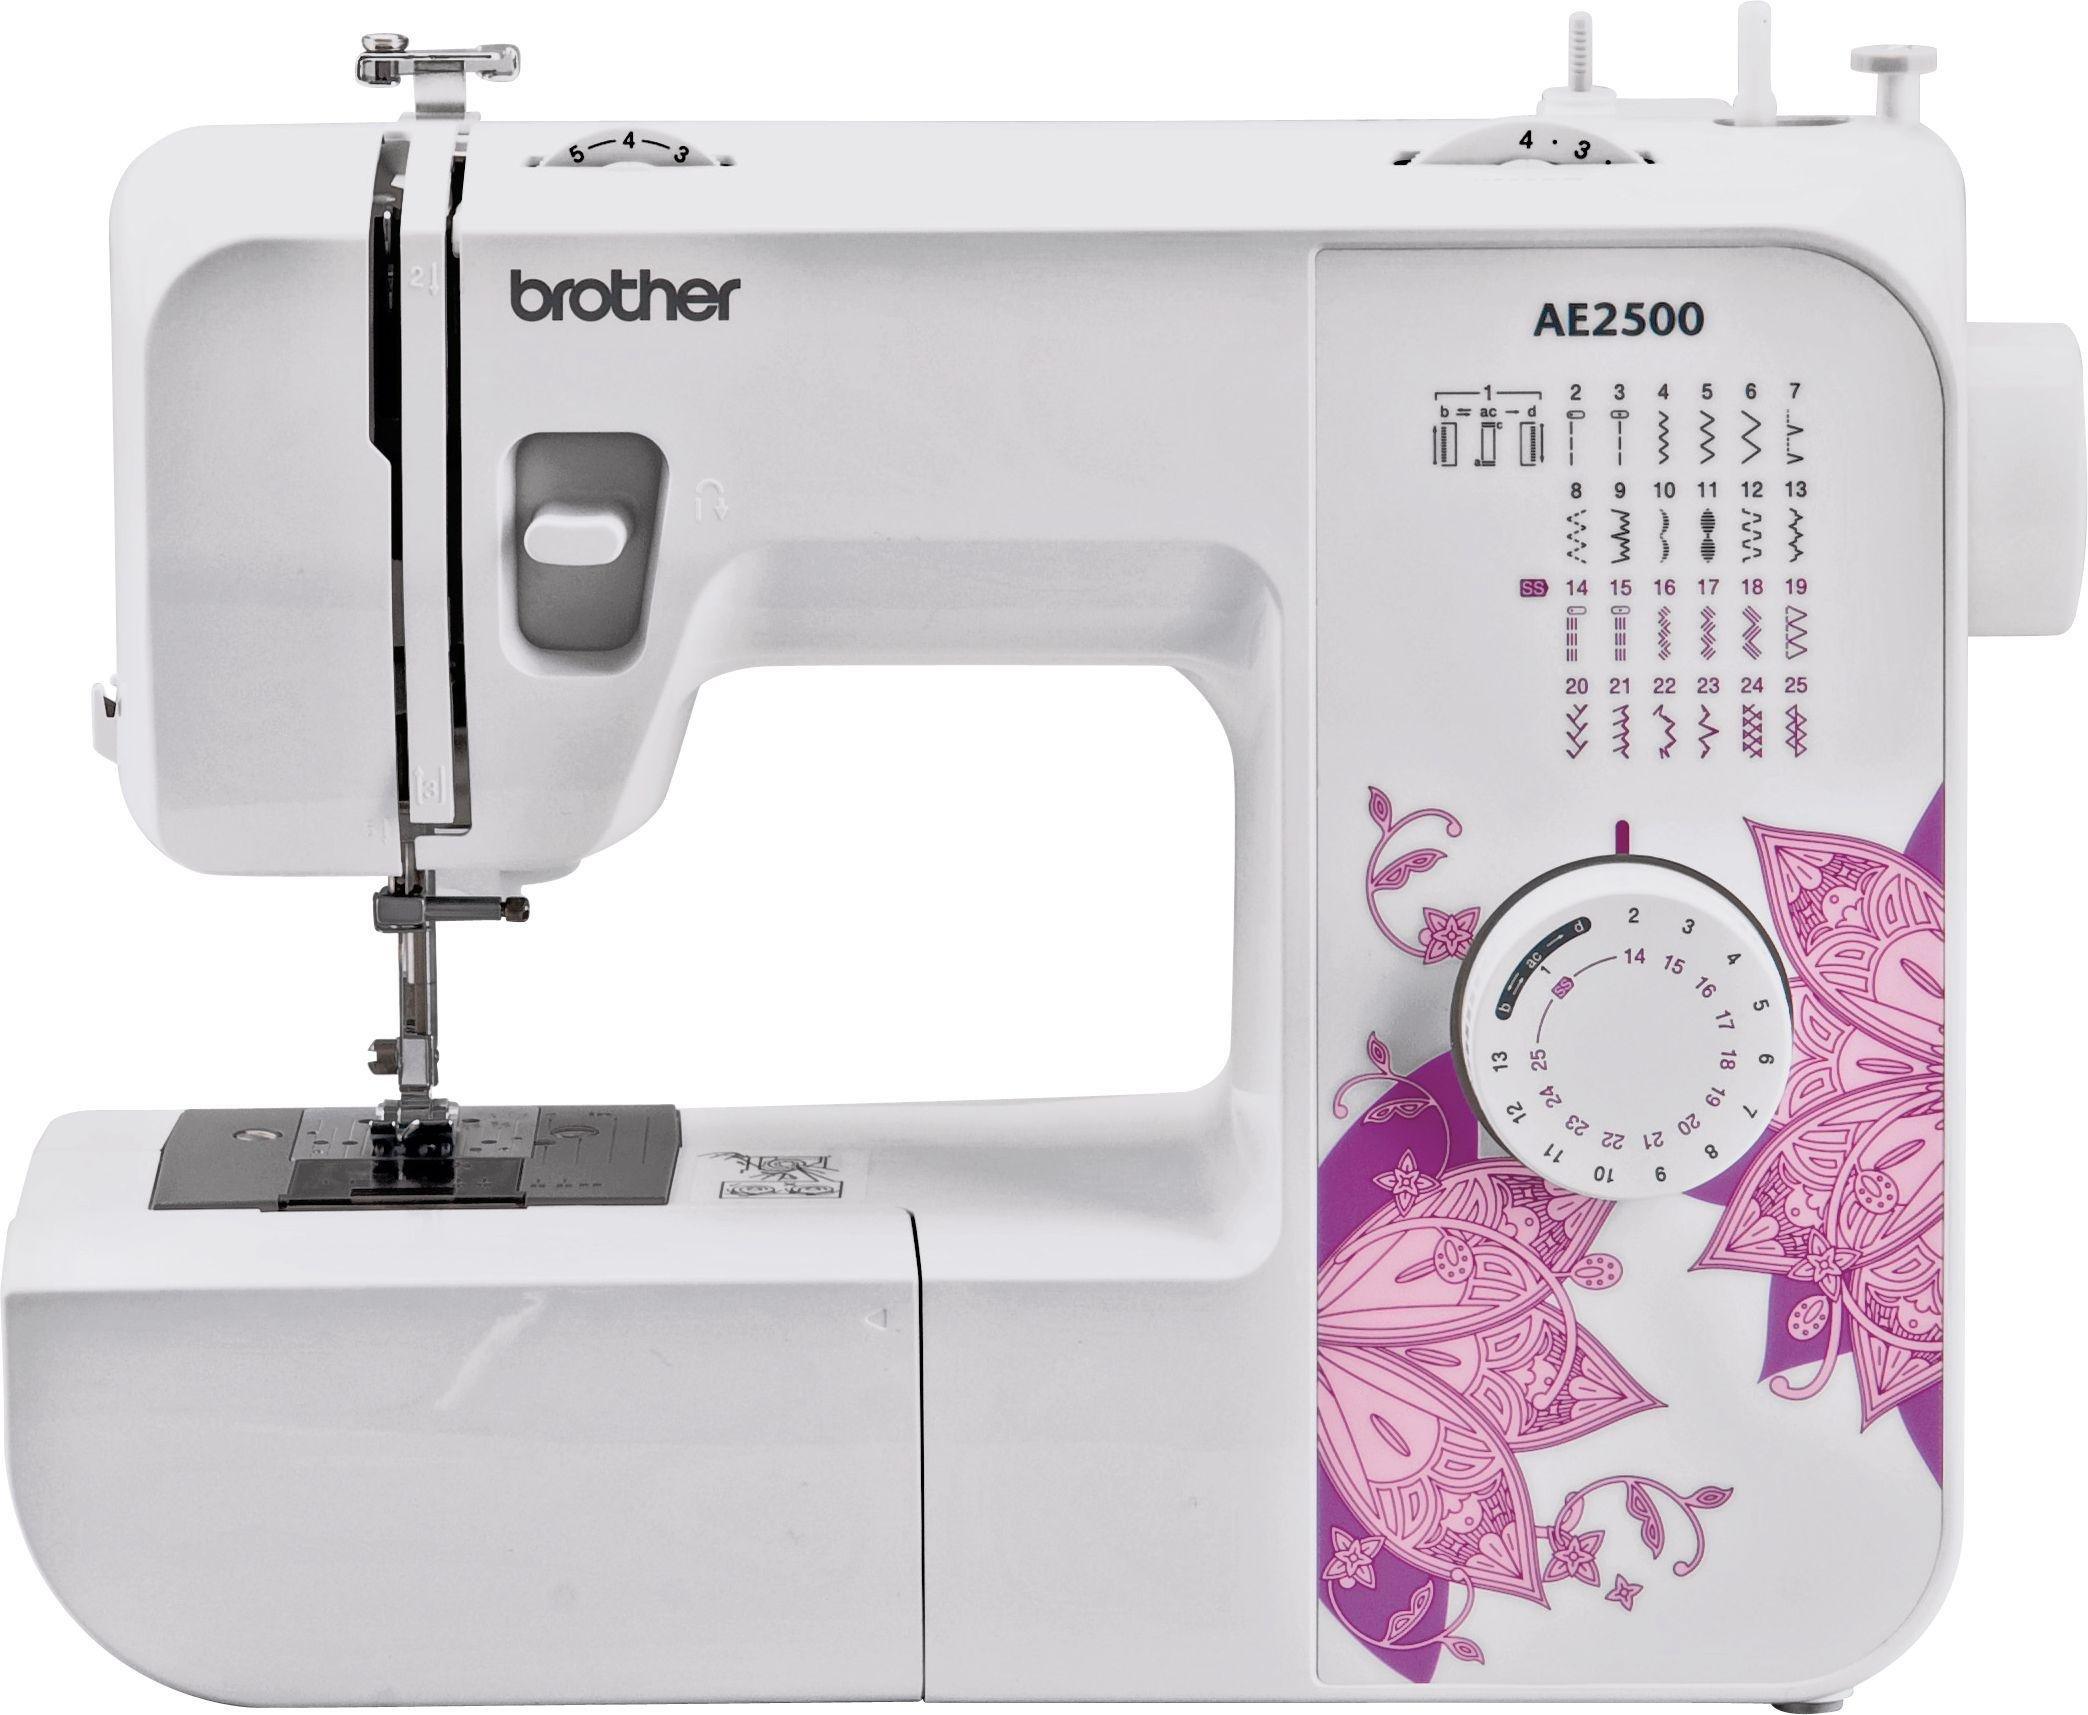 Brother AE2500 Stitch Sewing Machine